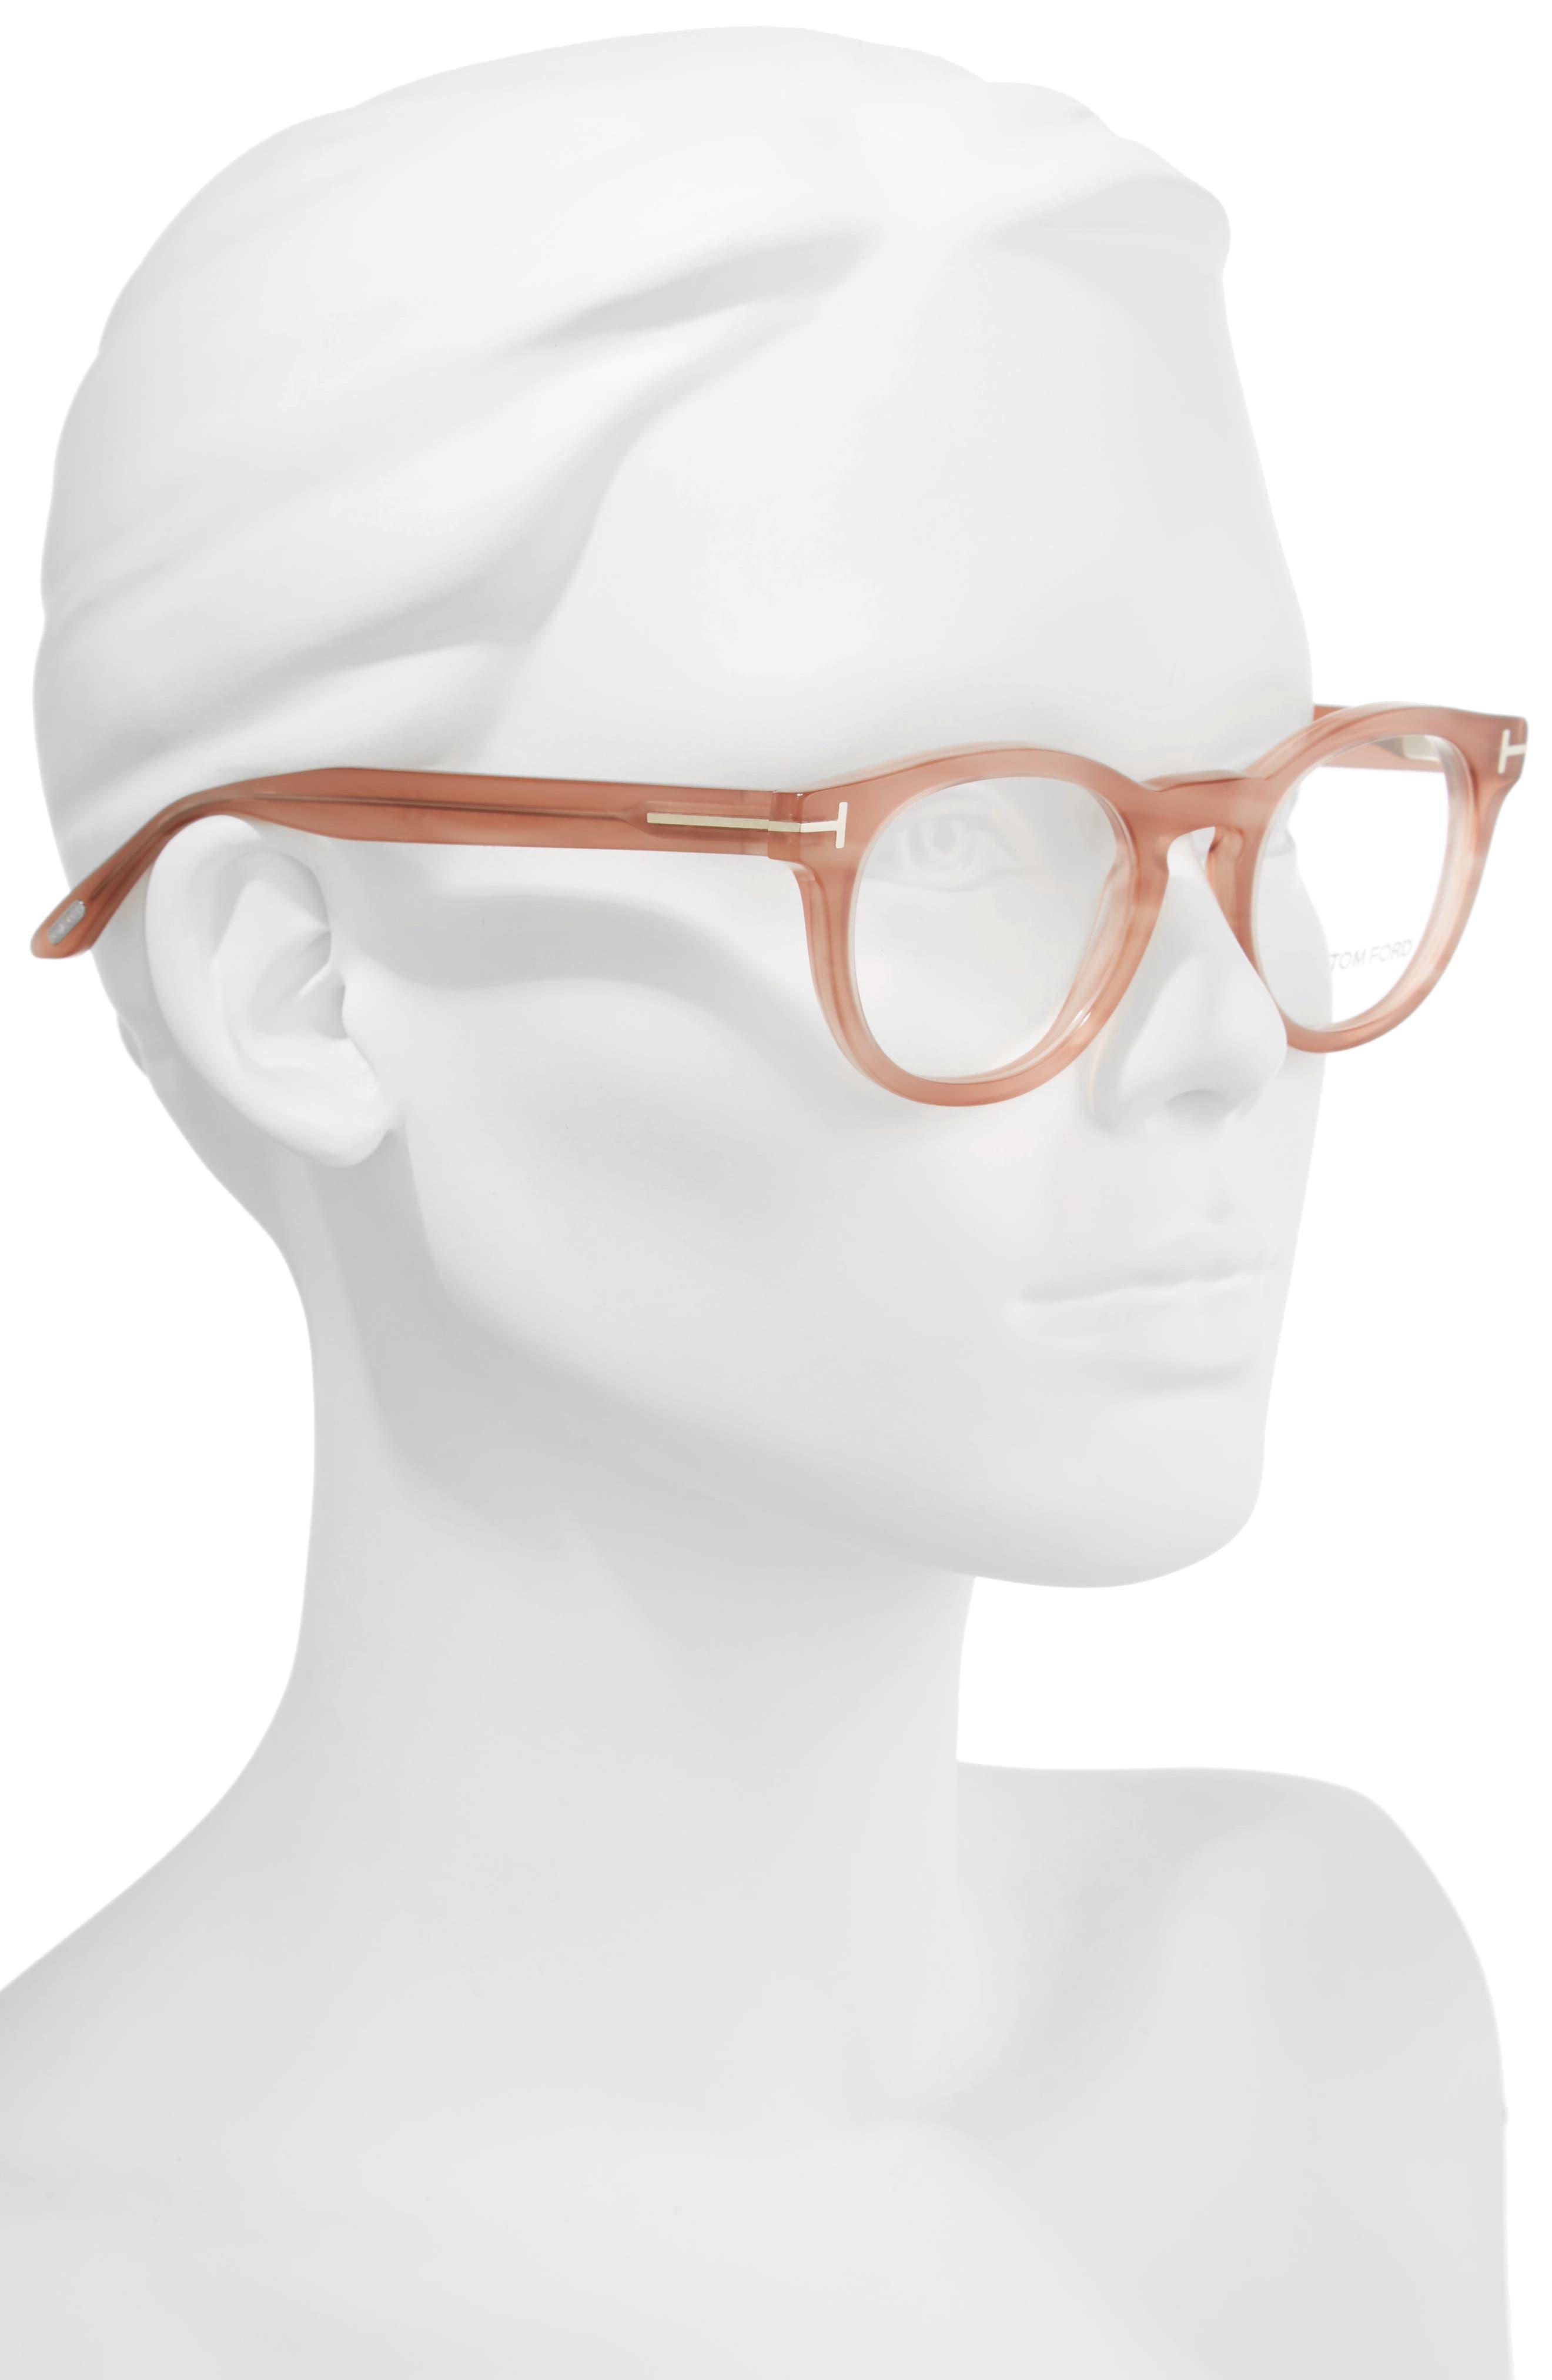 48mm Round Optical Glasses,                             Alternate thumbnail 6, color,